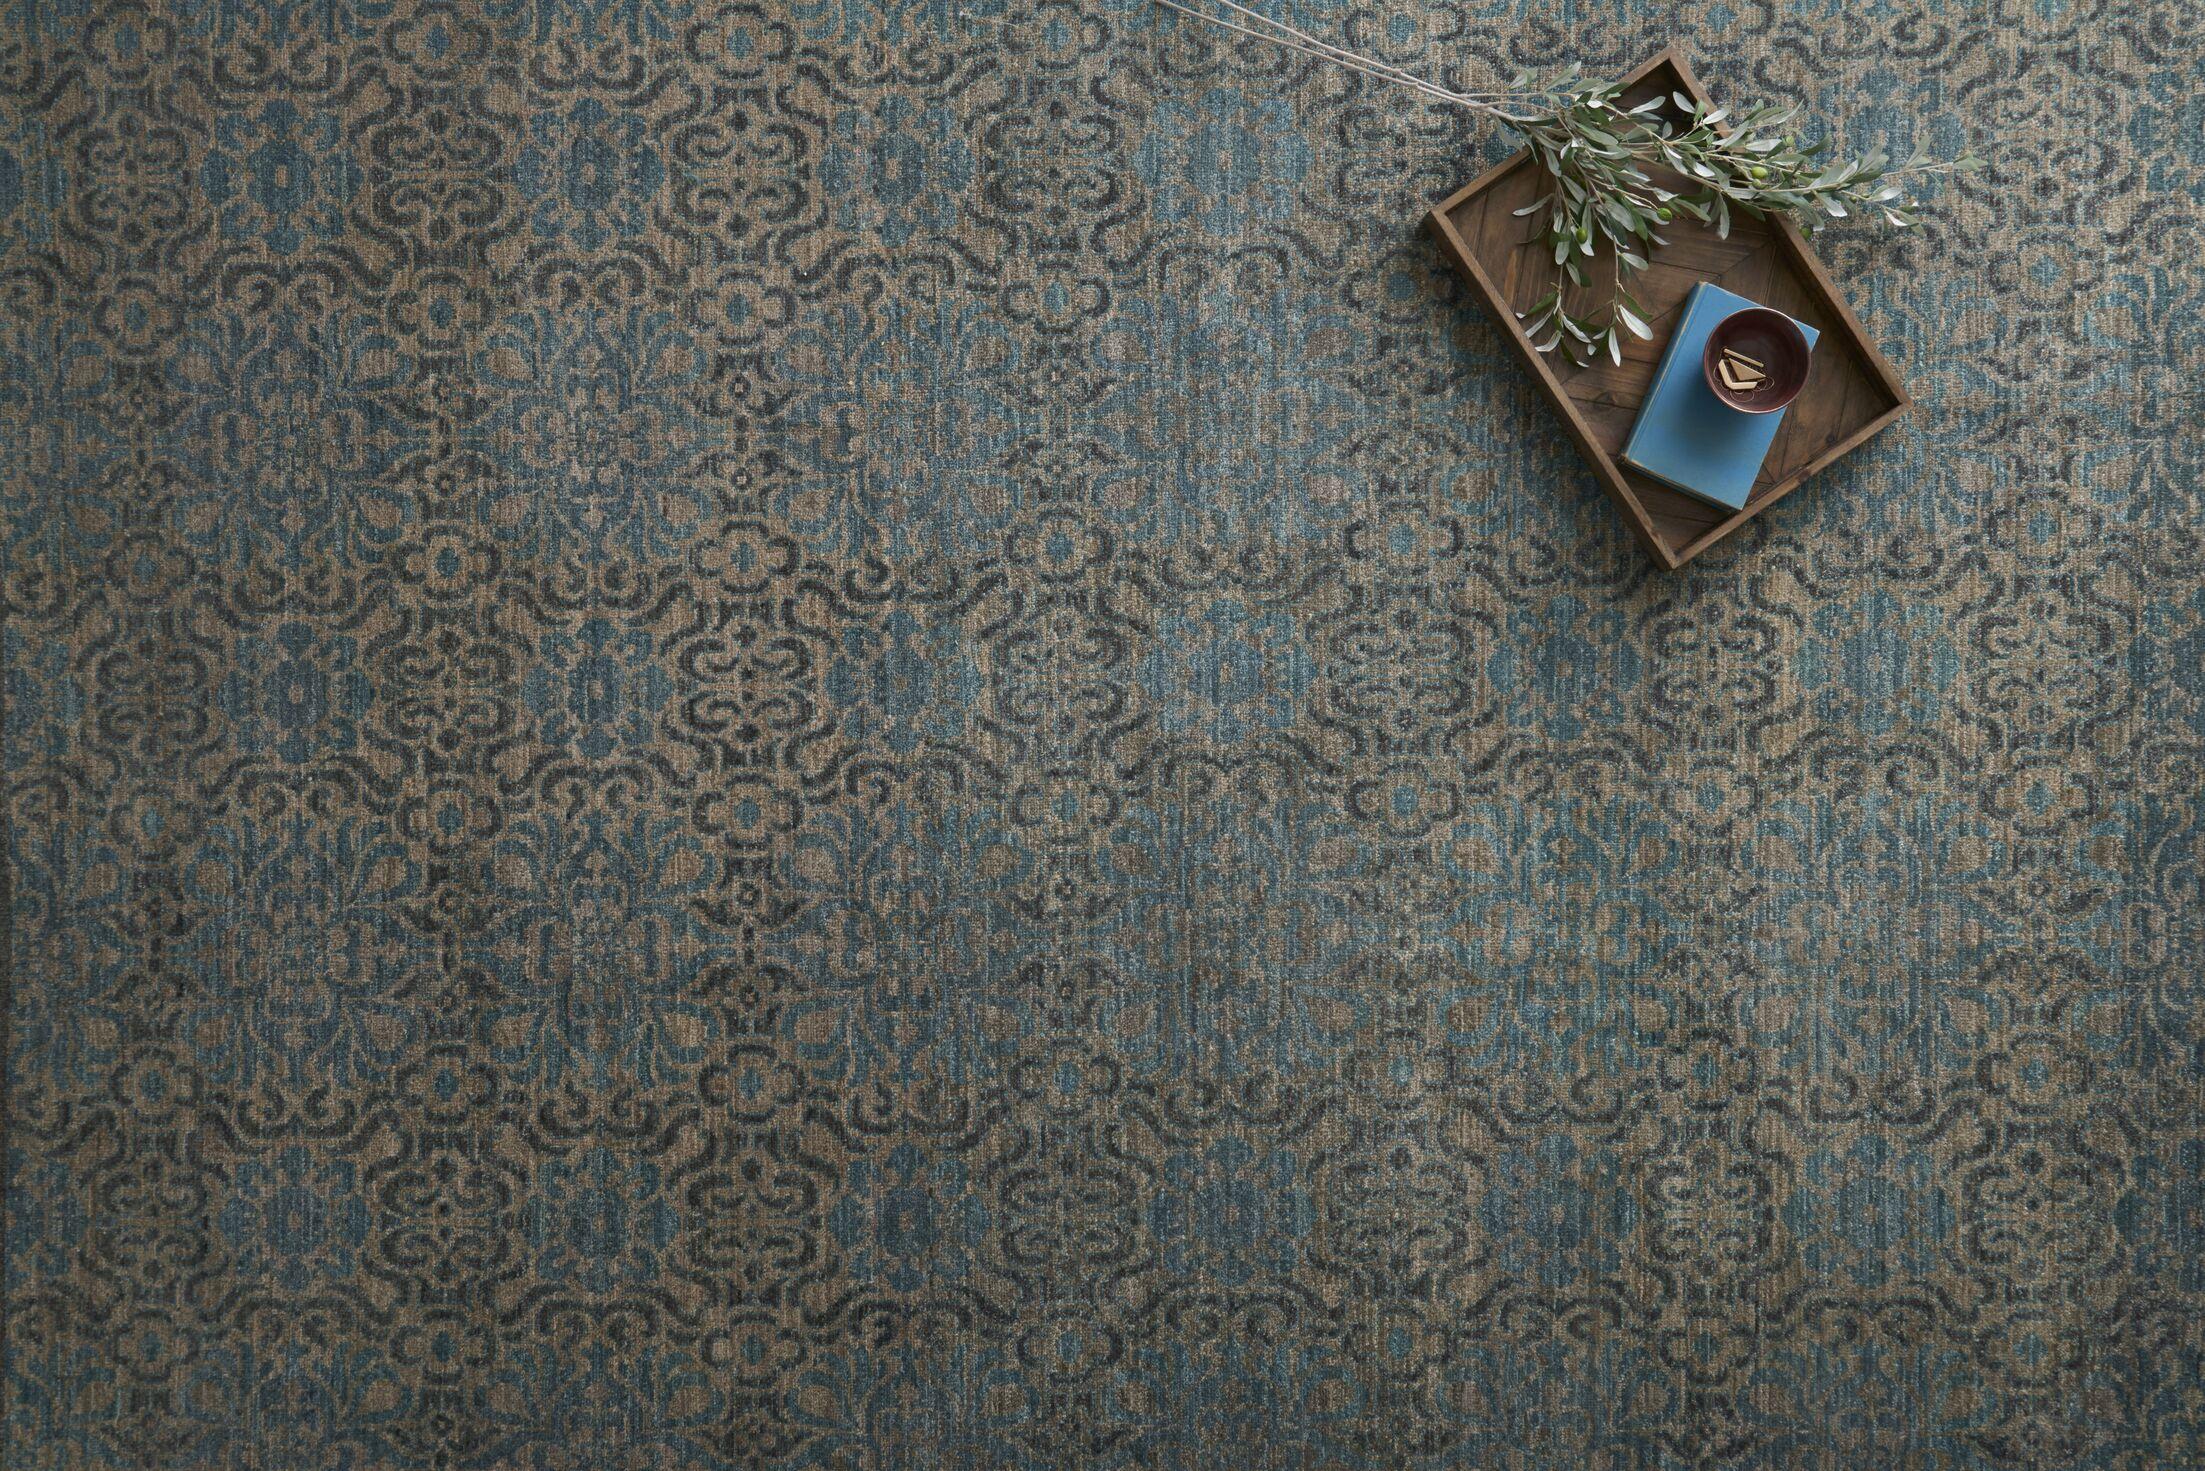 Claussen Hand Woven Wool Brown/Blue Area Rug Rug Size: Runner 2'6